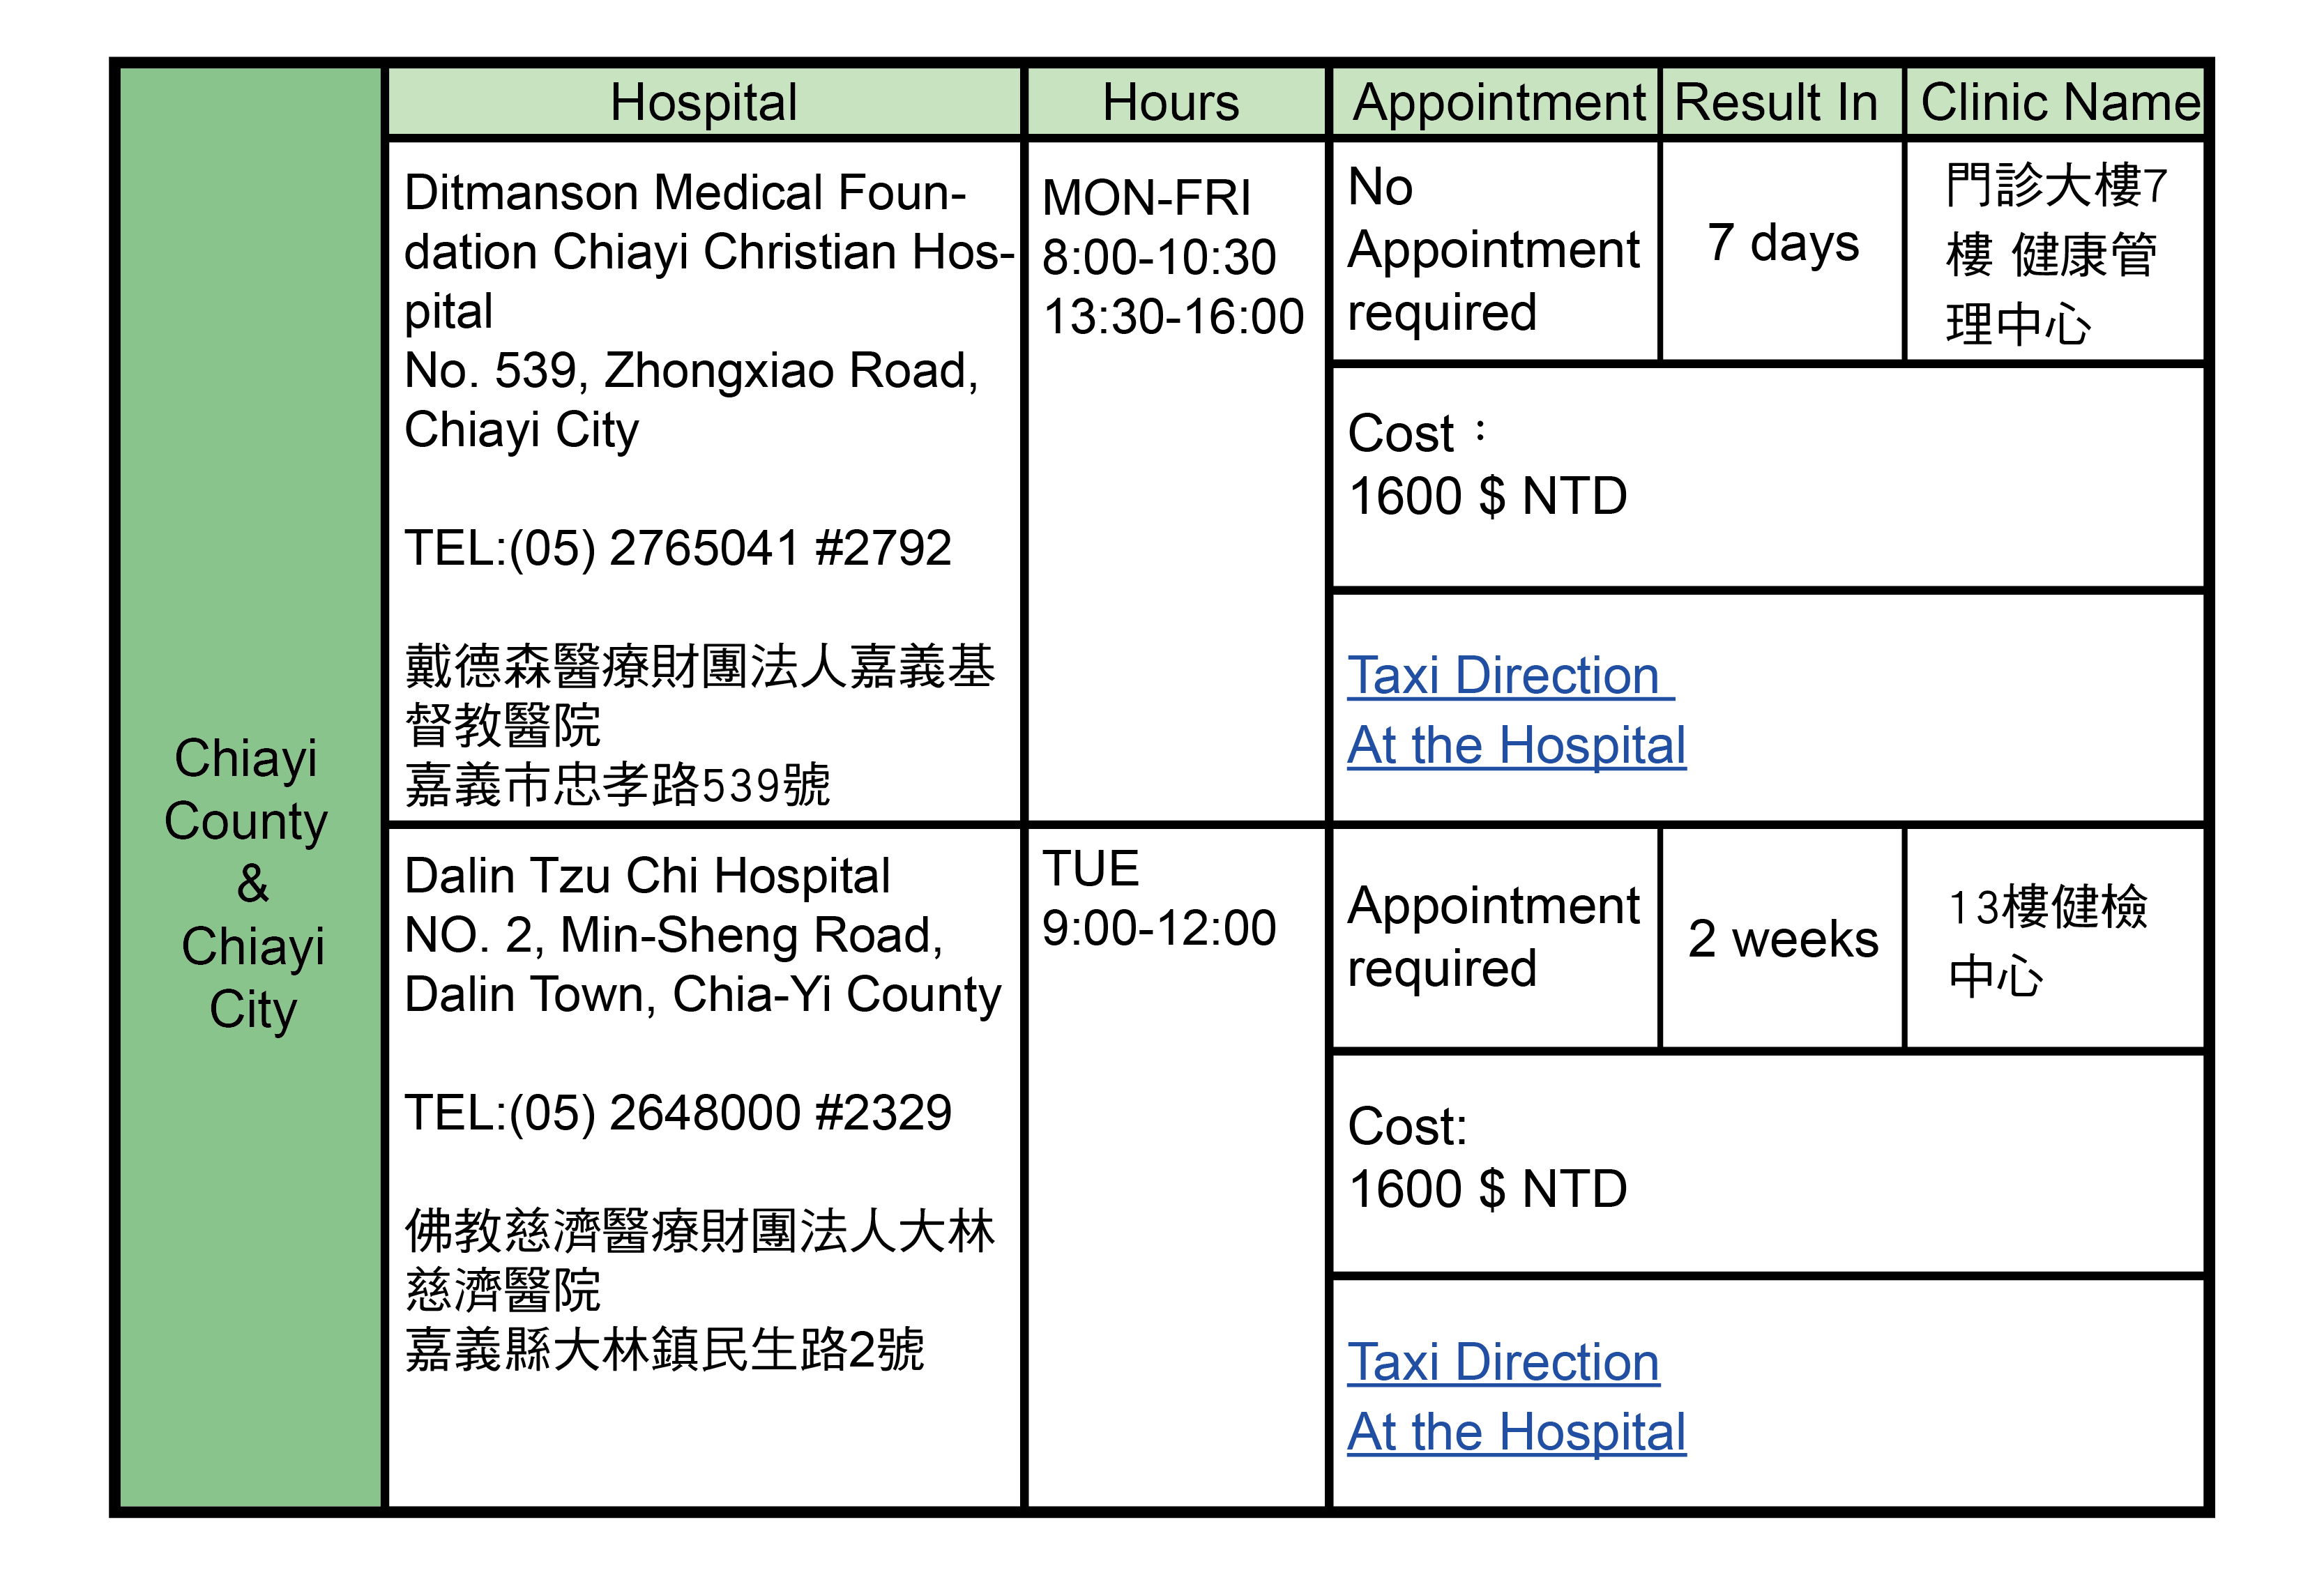 Chiayi County Chiayi City, Taiwan Health Check Hospitals Addresses